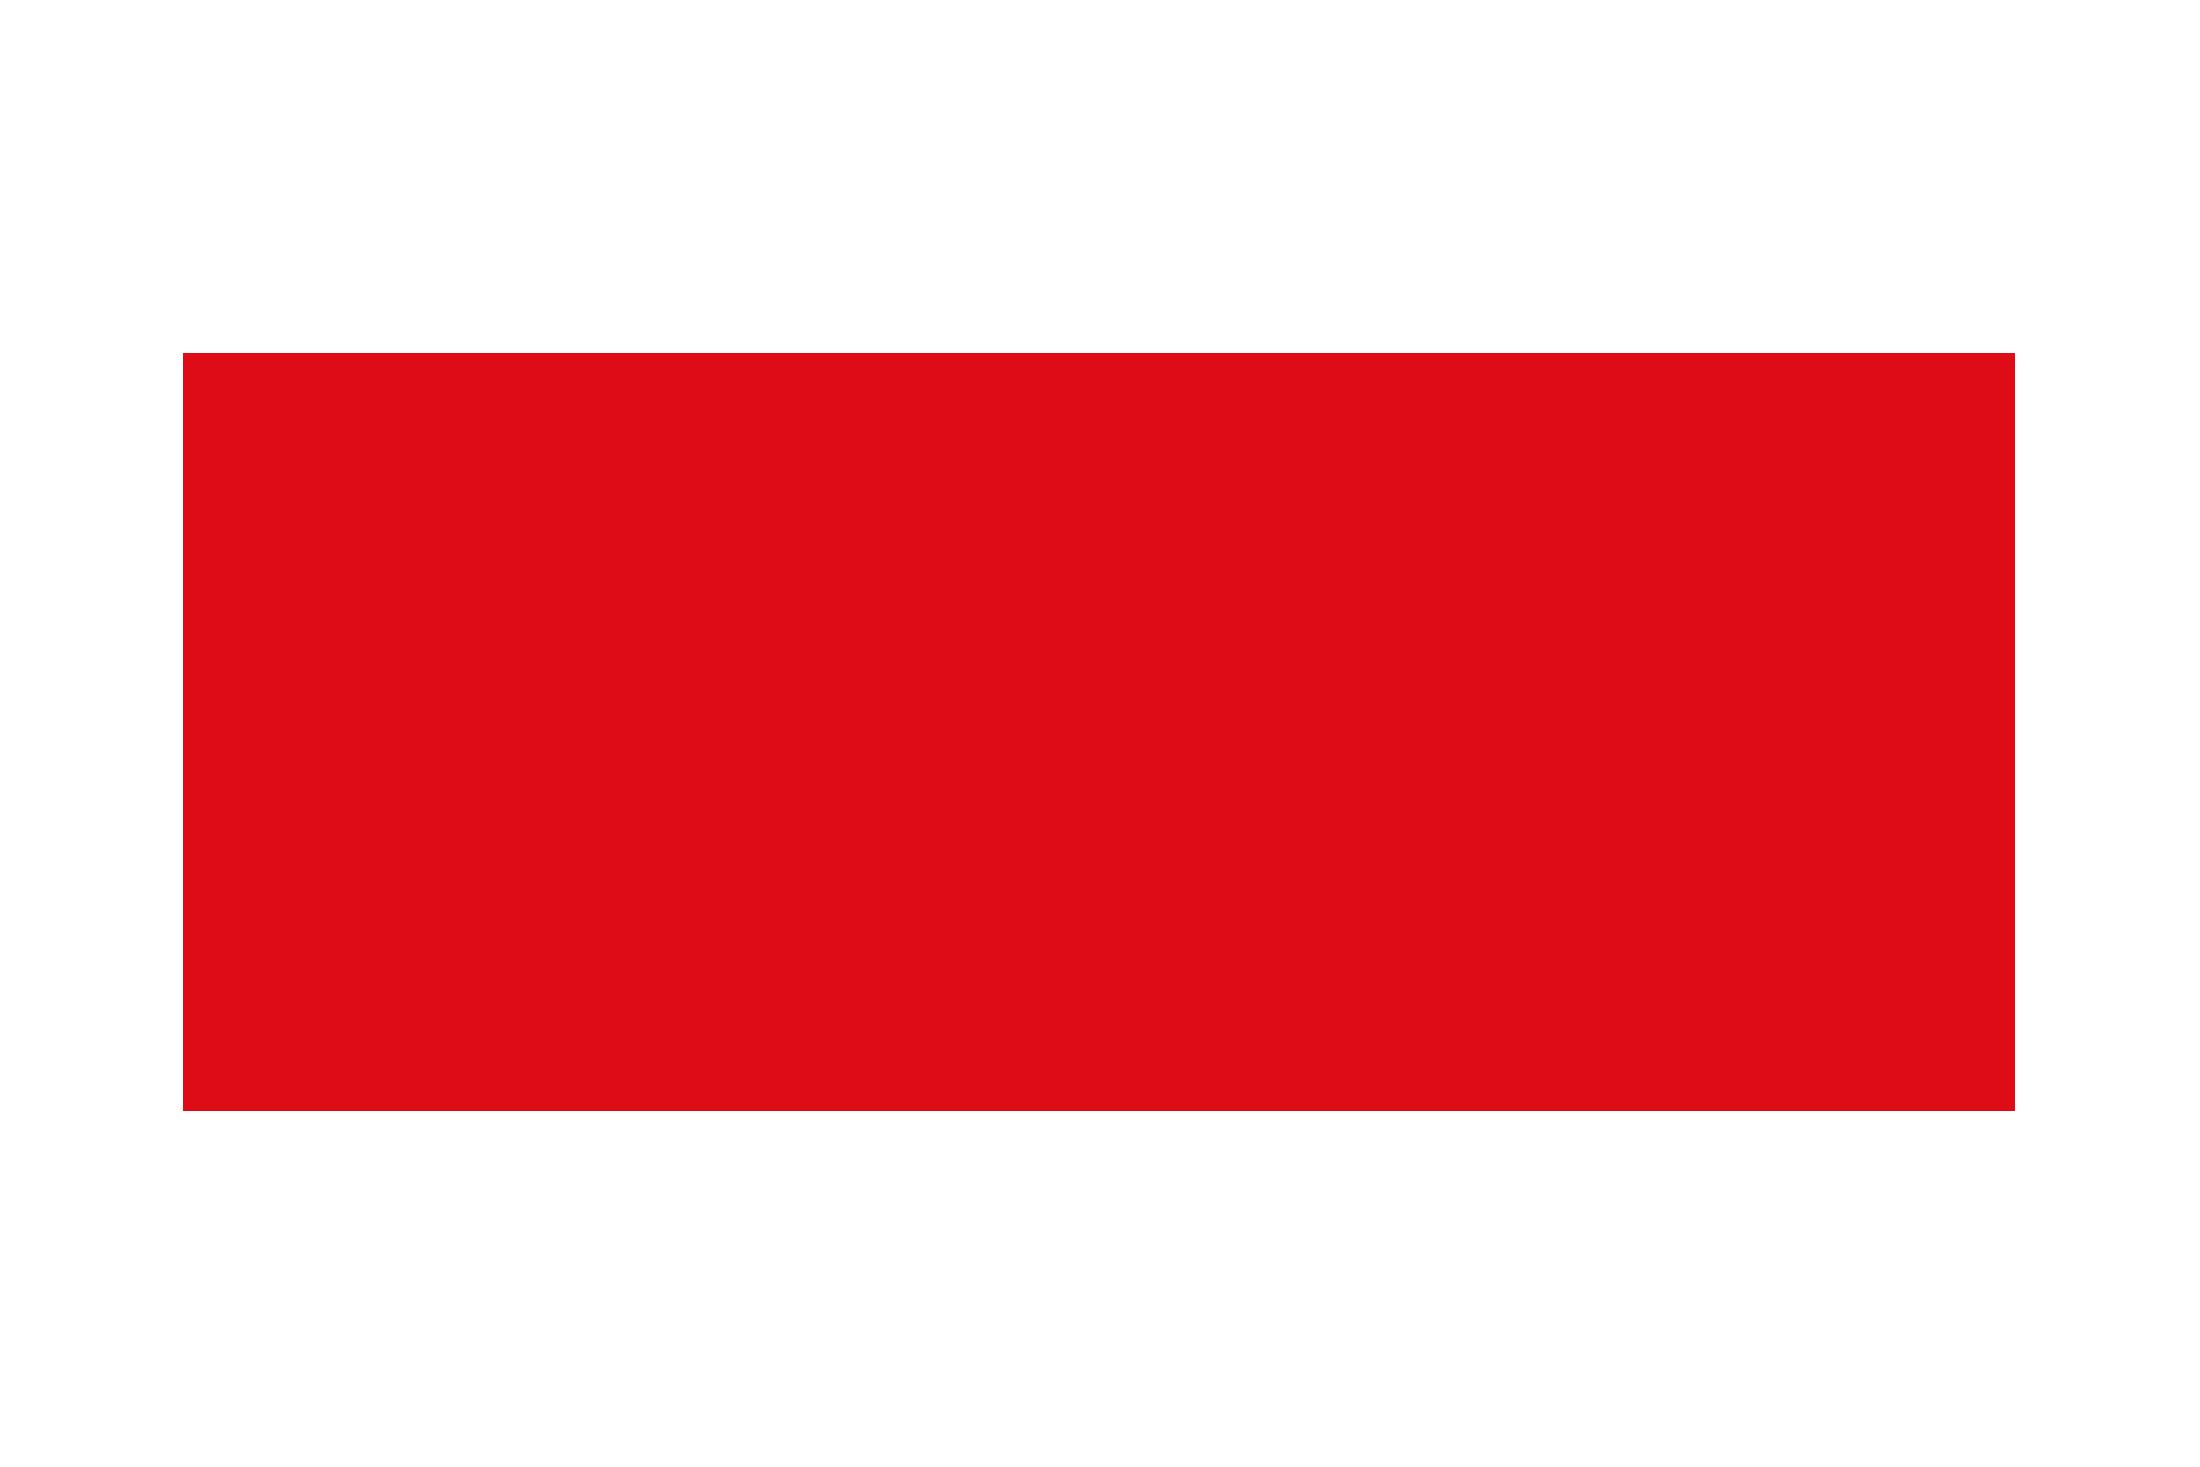 Grunge inspire label PSD